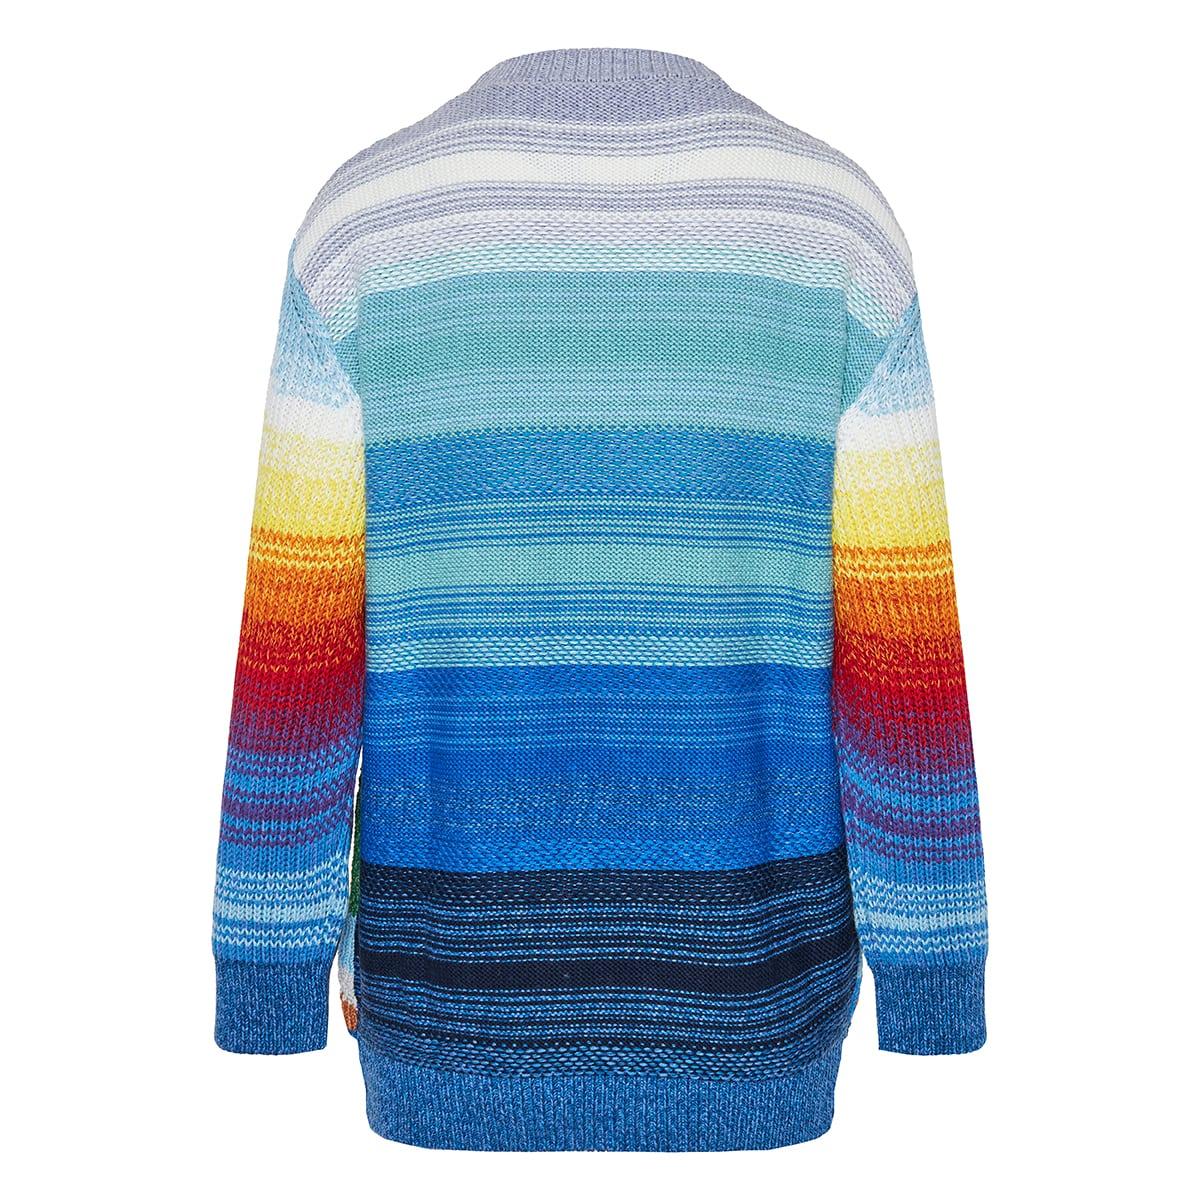 Oversized intarsia wool sweater